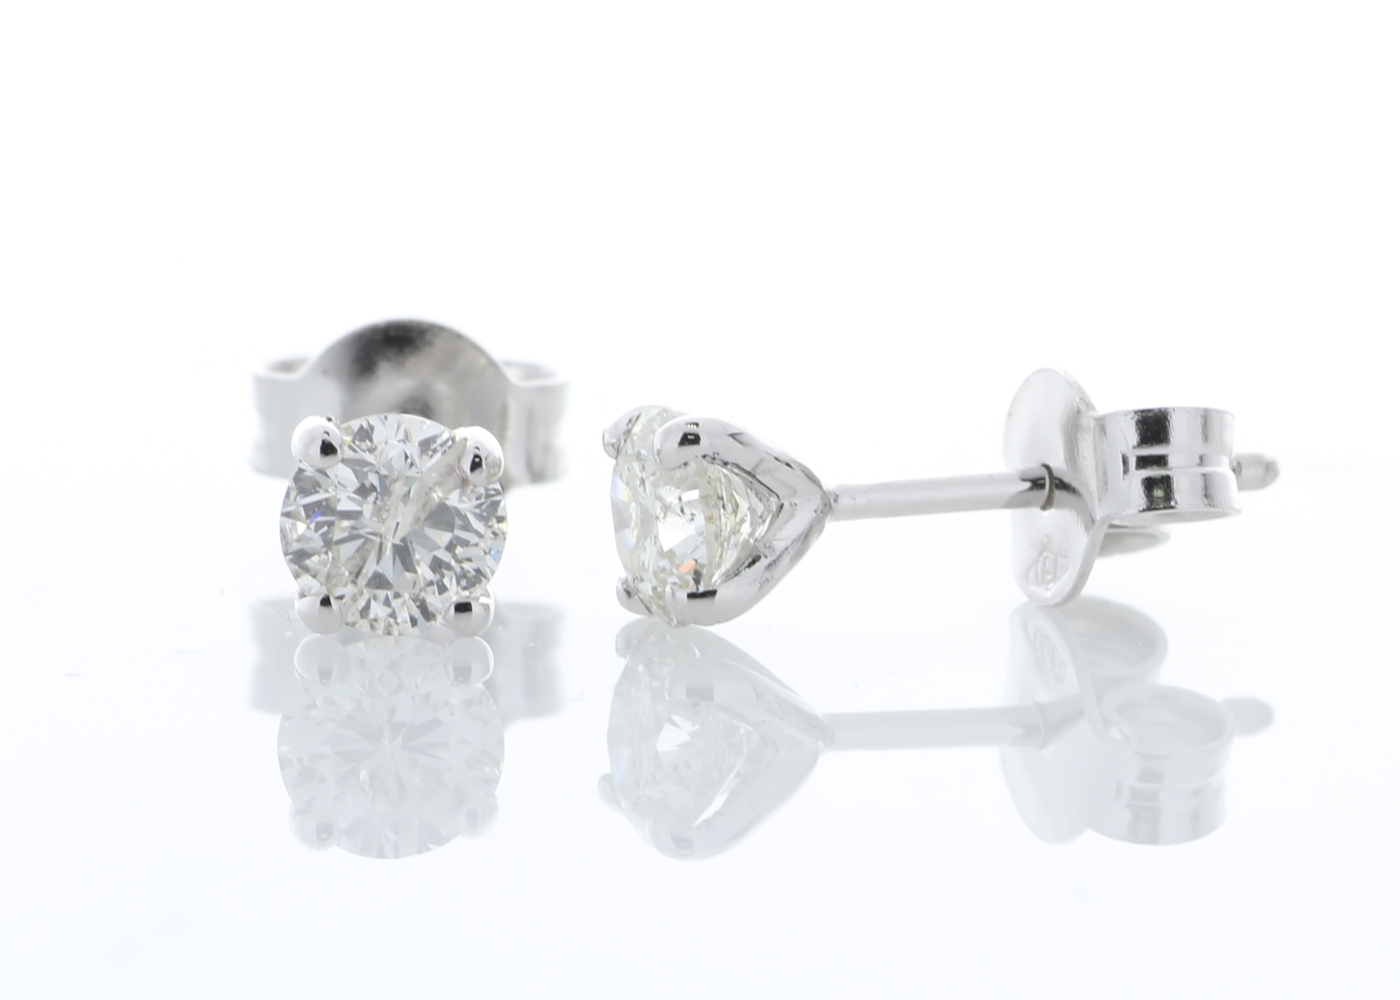 Lot 36 - 18ct White Gold Single Stone Prong Set Diamond Earring 0.80 Carats